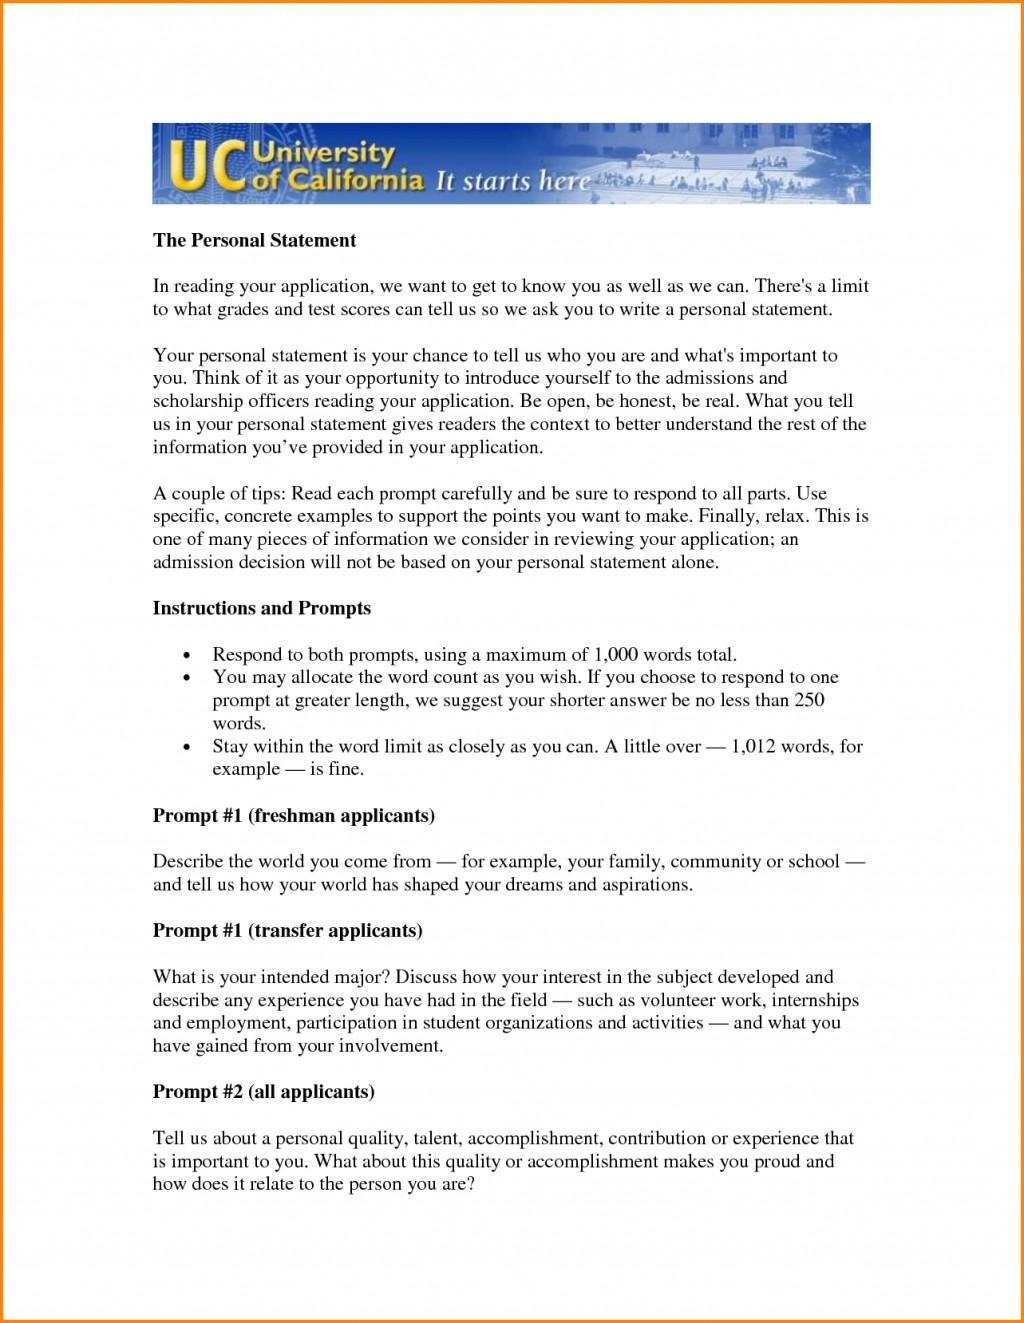 016 Uc Essay Prompt Application Prompts Davis College Personal Statement Guy Berkeleys Imposing 2016-17 Examples 1 Berkeley 2017 Large